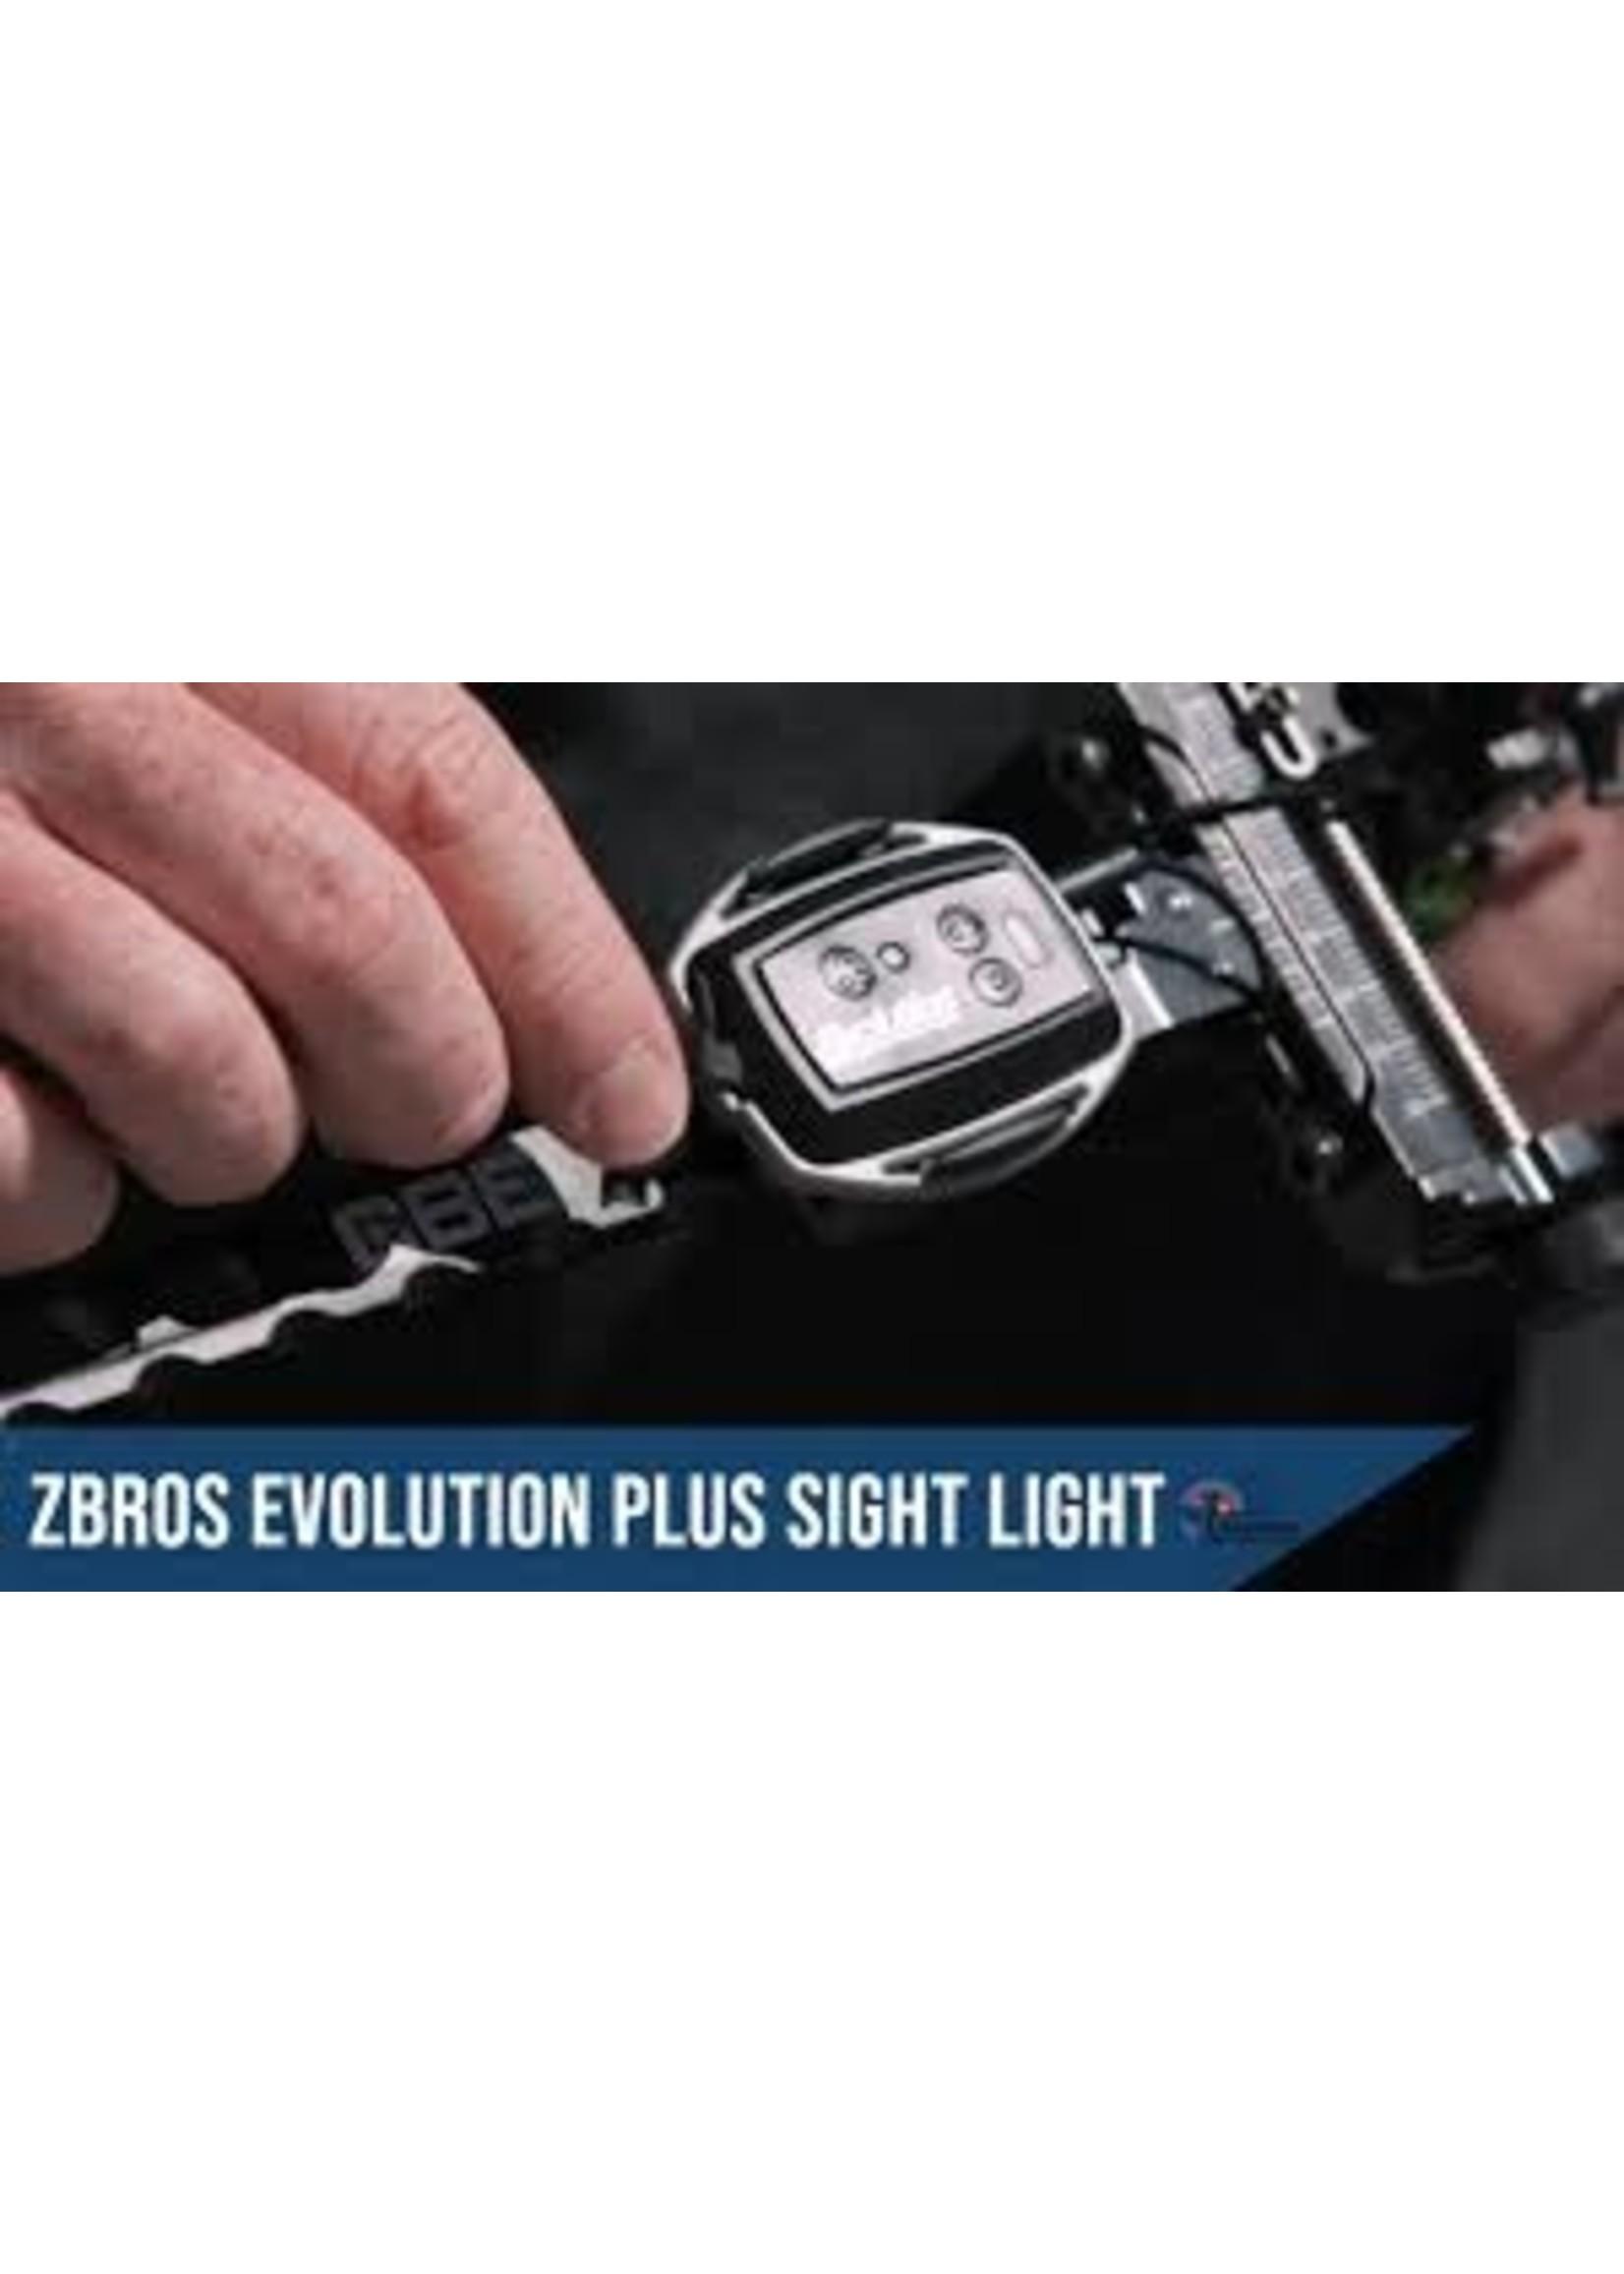 Shrewd Zbros Evolution Plus Light System